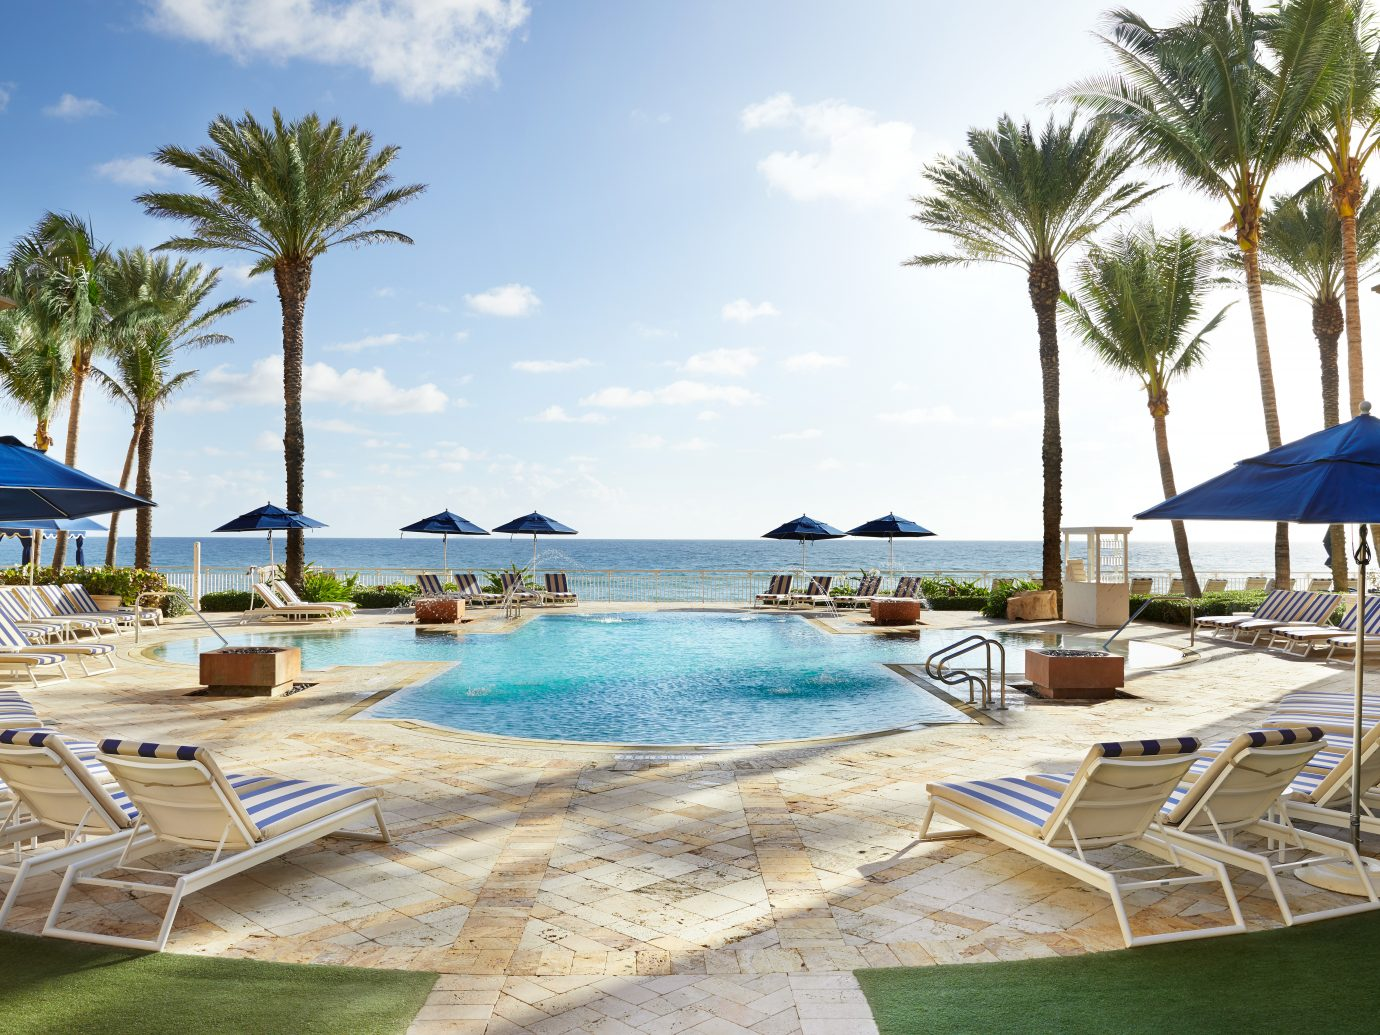 pool at Eau Palm Beach Resort & Spa, Manalapan, FL